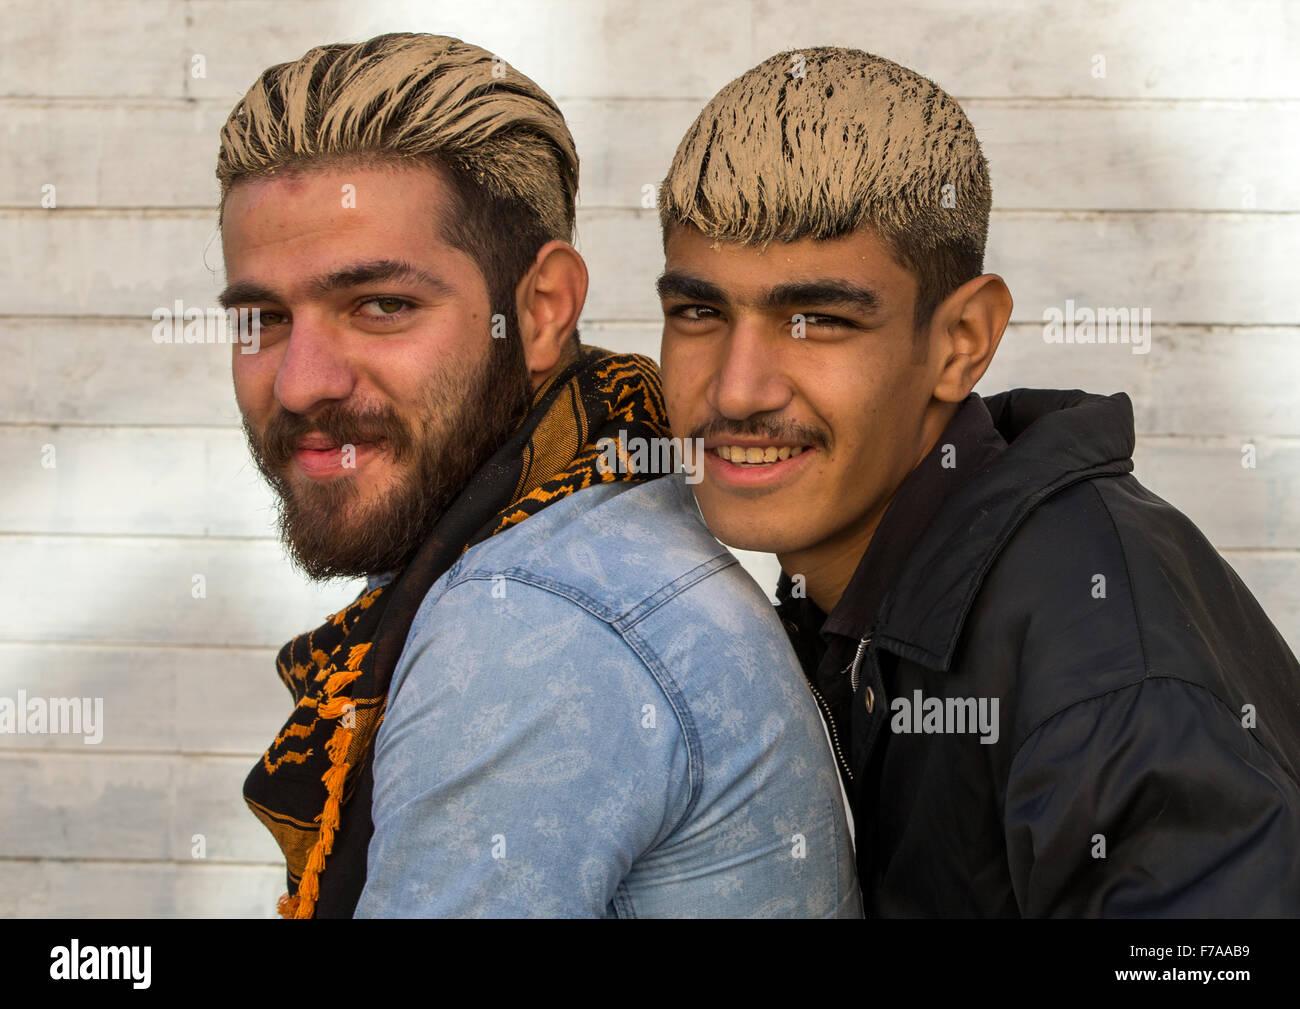 Iranian men looking good 20 Countries